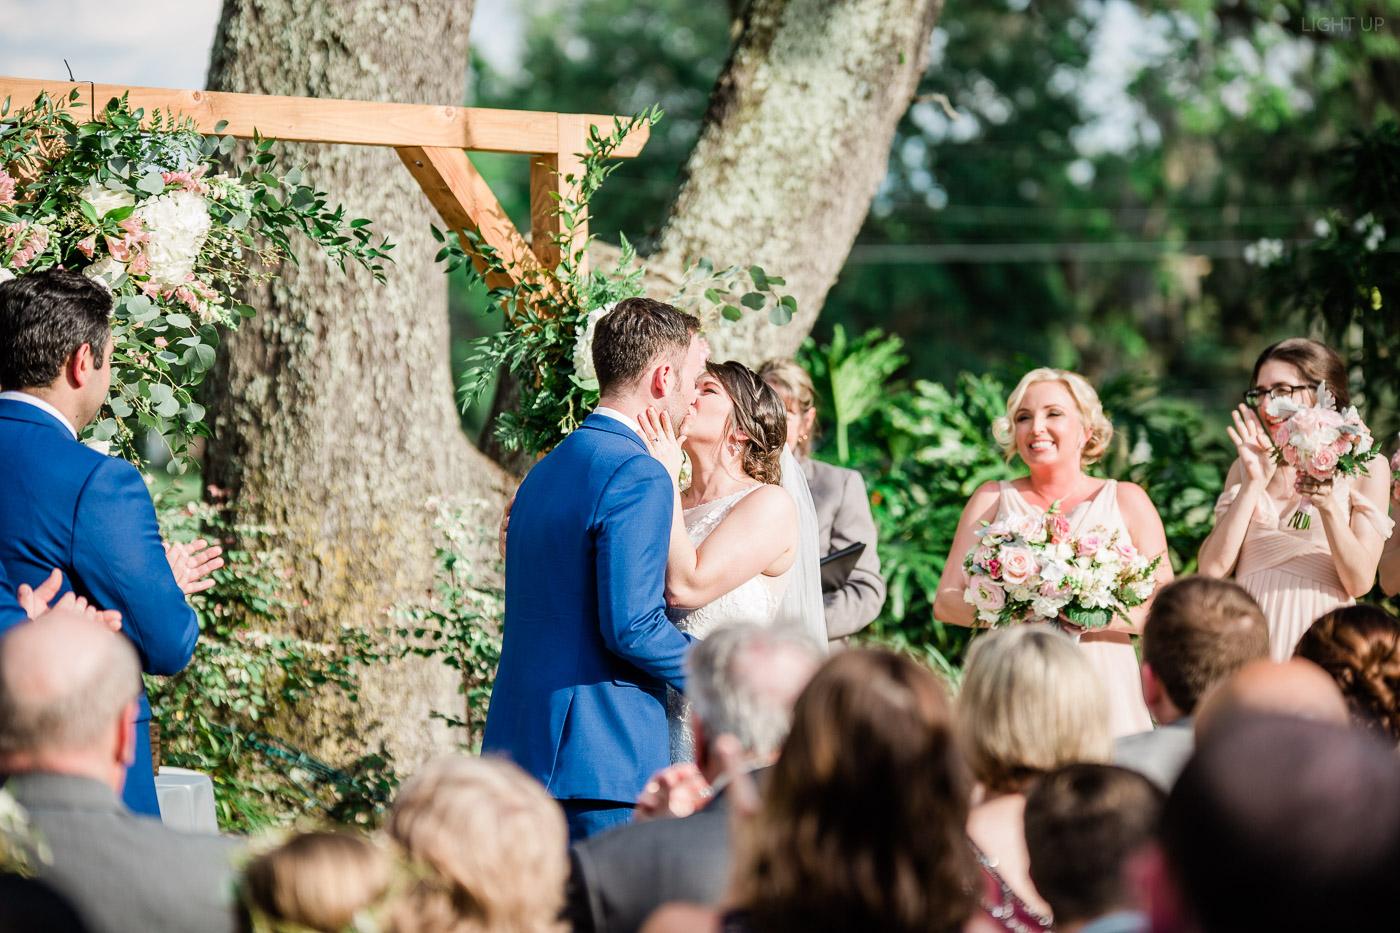 hstoric-dubsdread-wedding-orlando-16.jpg